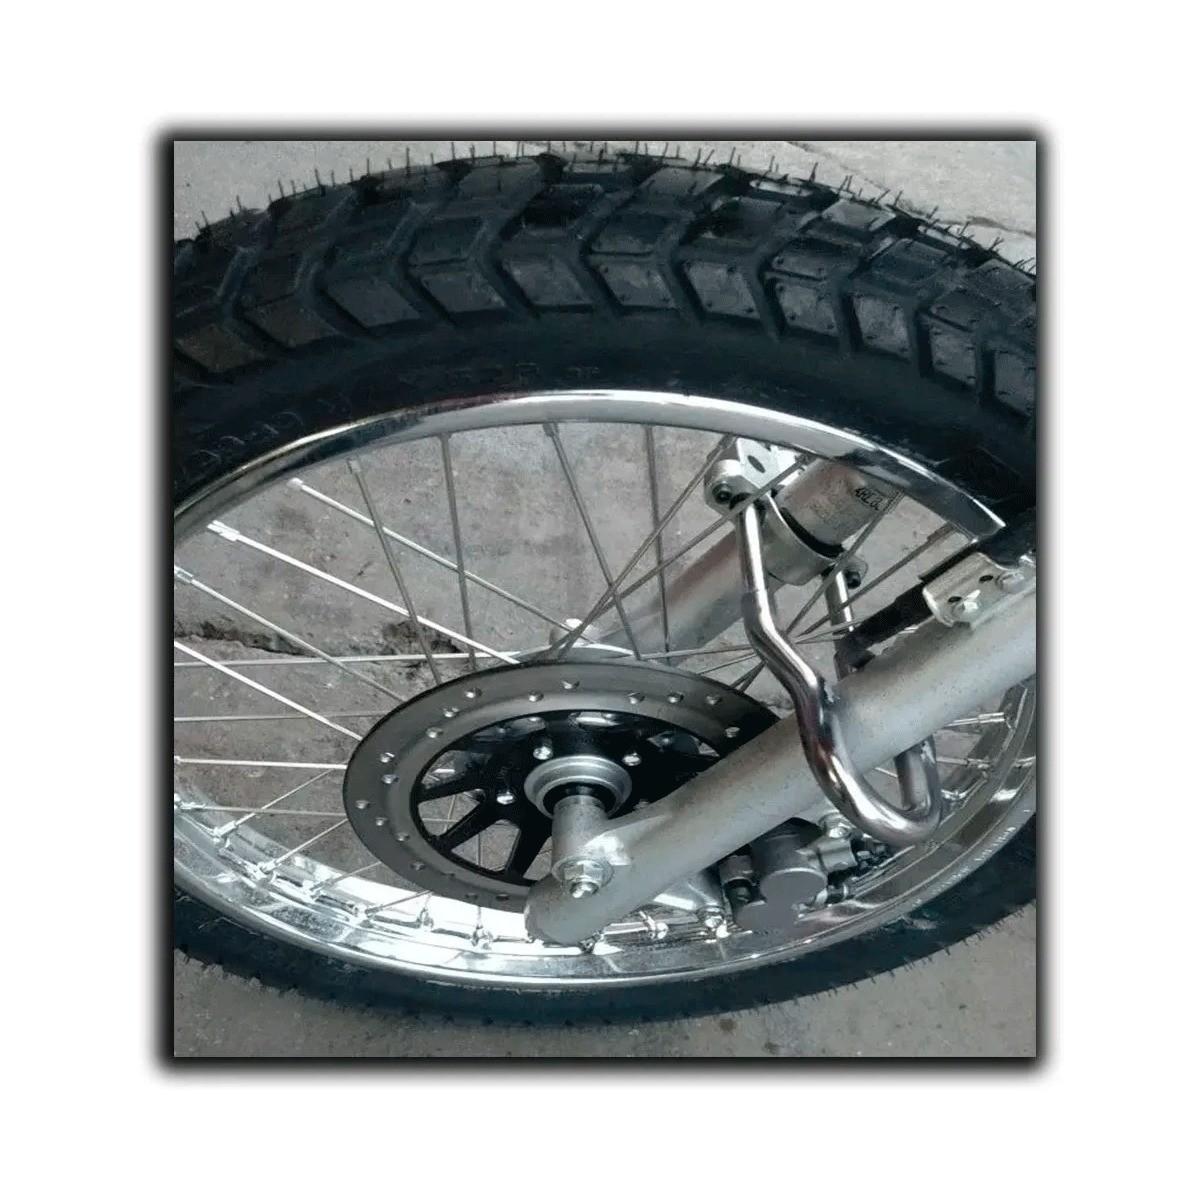 Tranca Trava Bengala Segurança ANTI FURTO Moto HONDA CBX 250 Twister Tornado NX 400 Falcon